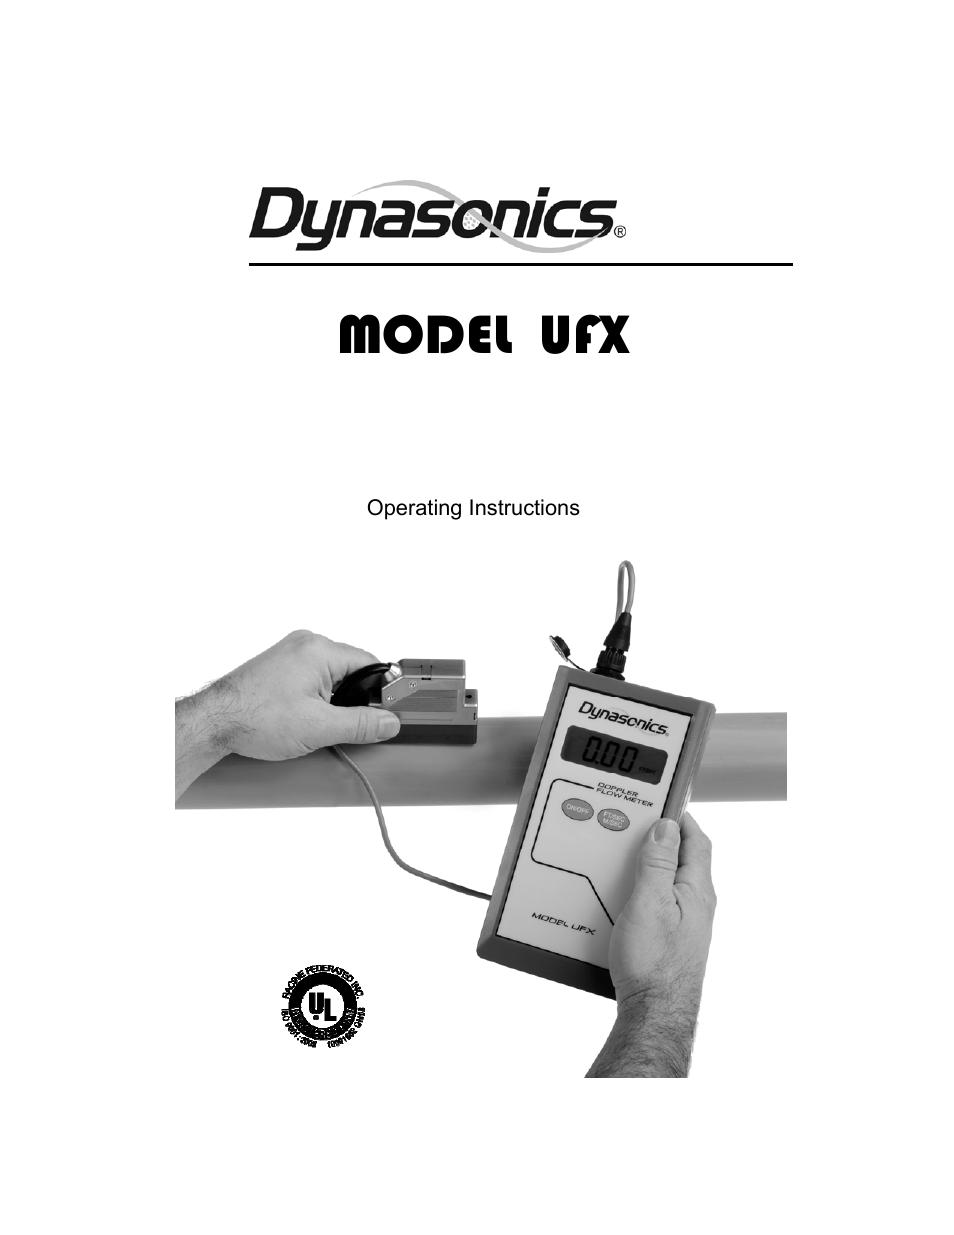 dynasonics ufx ultrasonic flow meter user manual